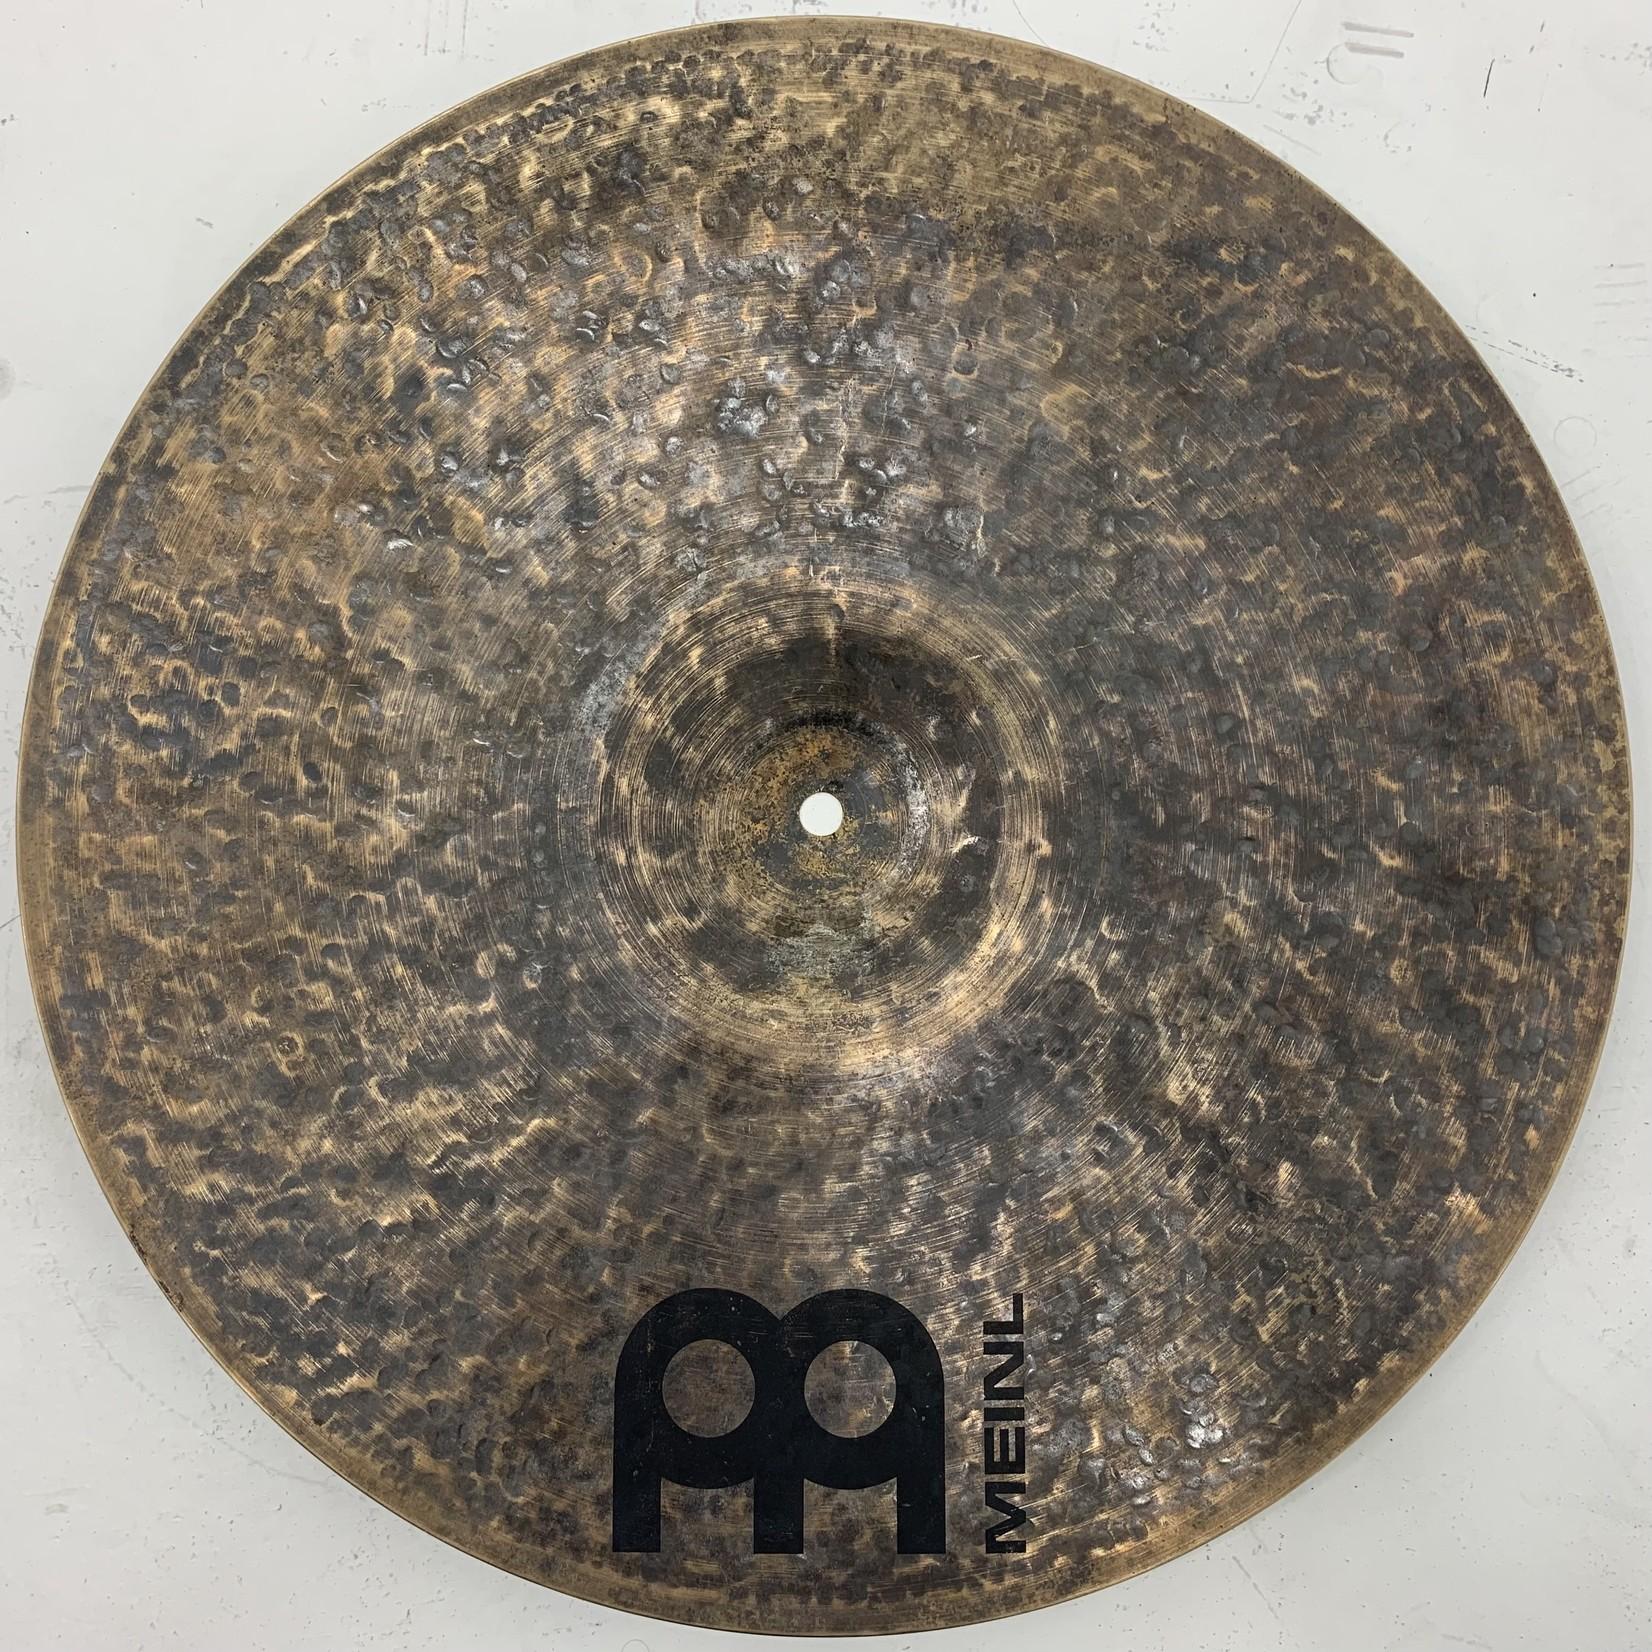 "USED Meinl Byzance 17"" Dark Crash Cymbal (Michael Wagener Collection)"